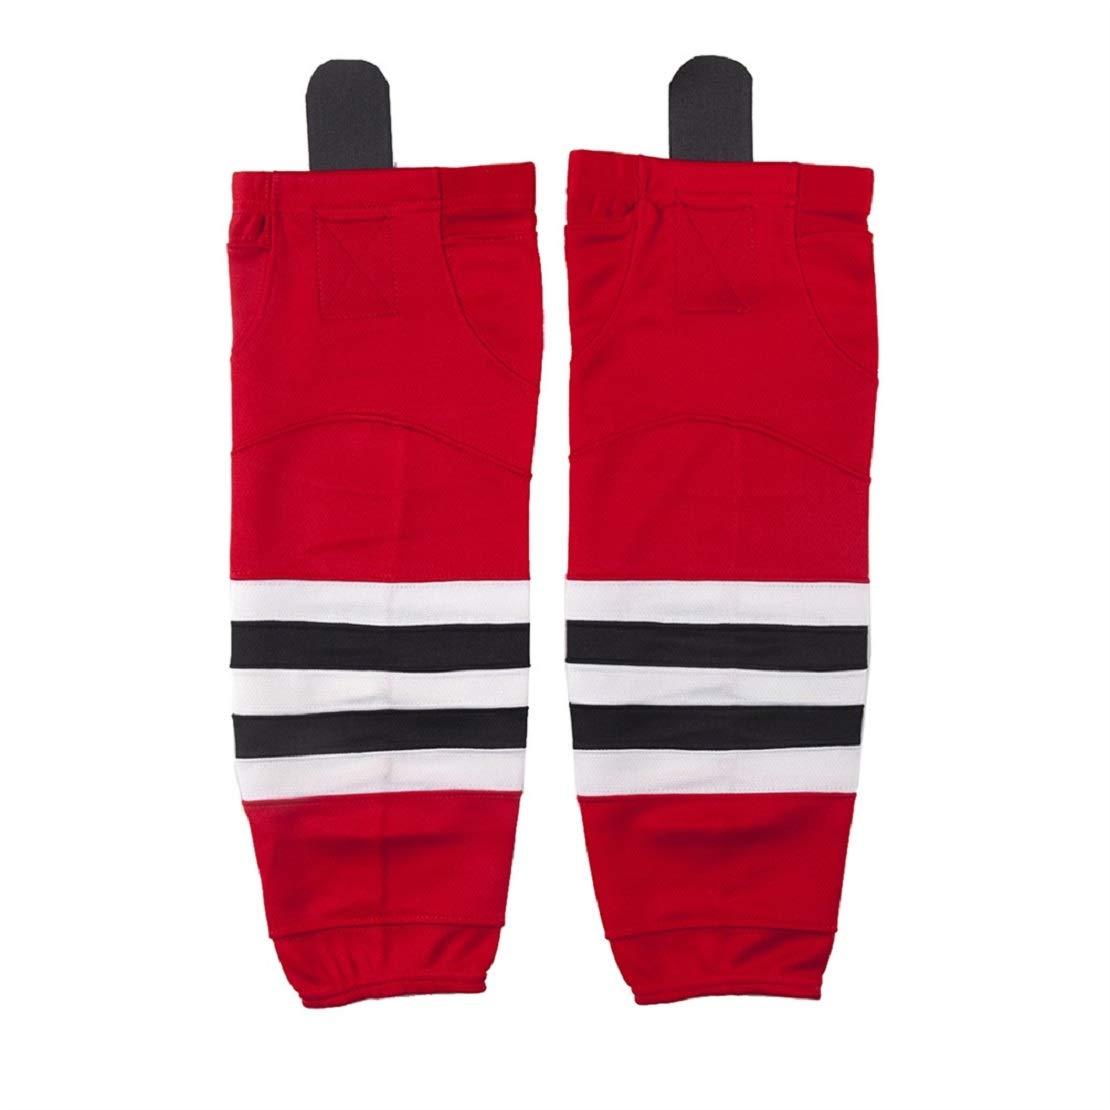 COLDINDOOR Ice Hockey Socks Kids, Boy Youth School Team Game Practice Hockey Socks Junior Red XS by COLDINDOOR